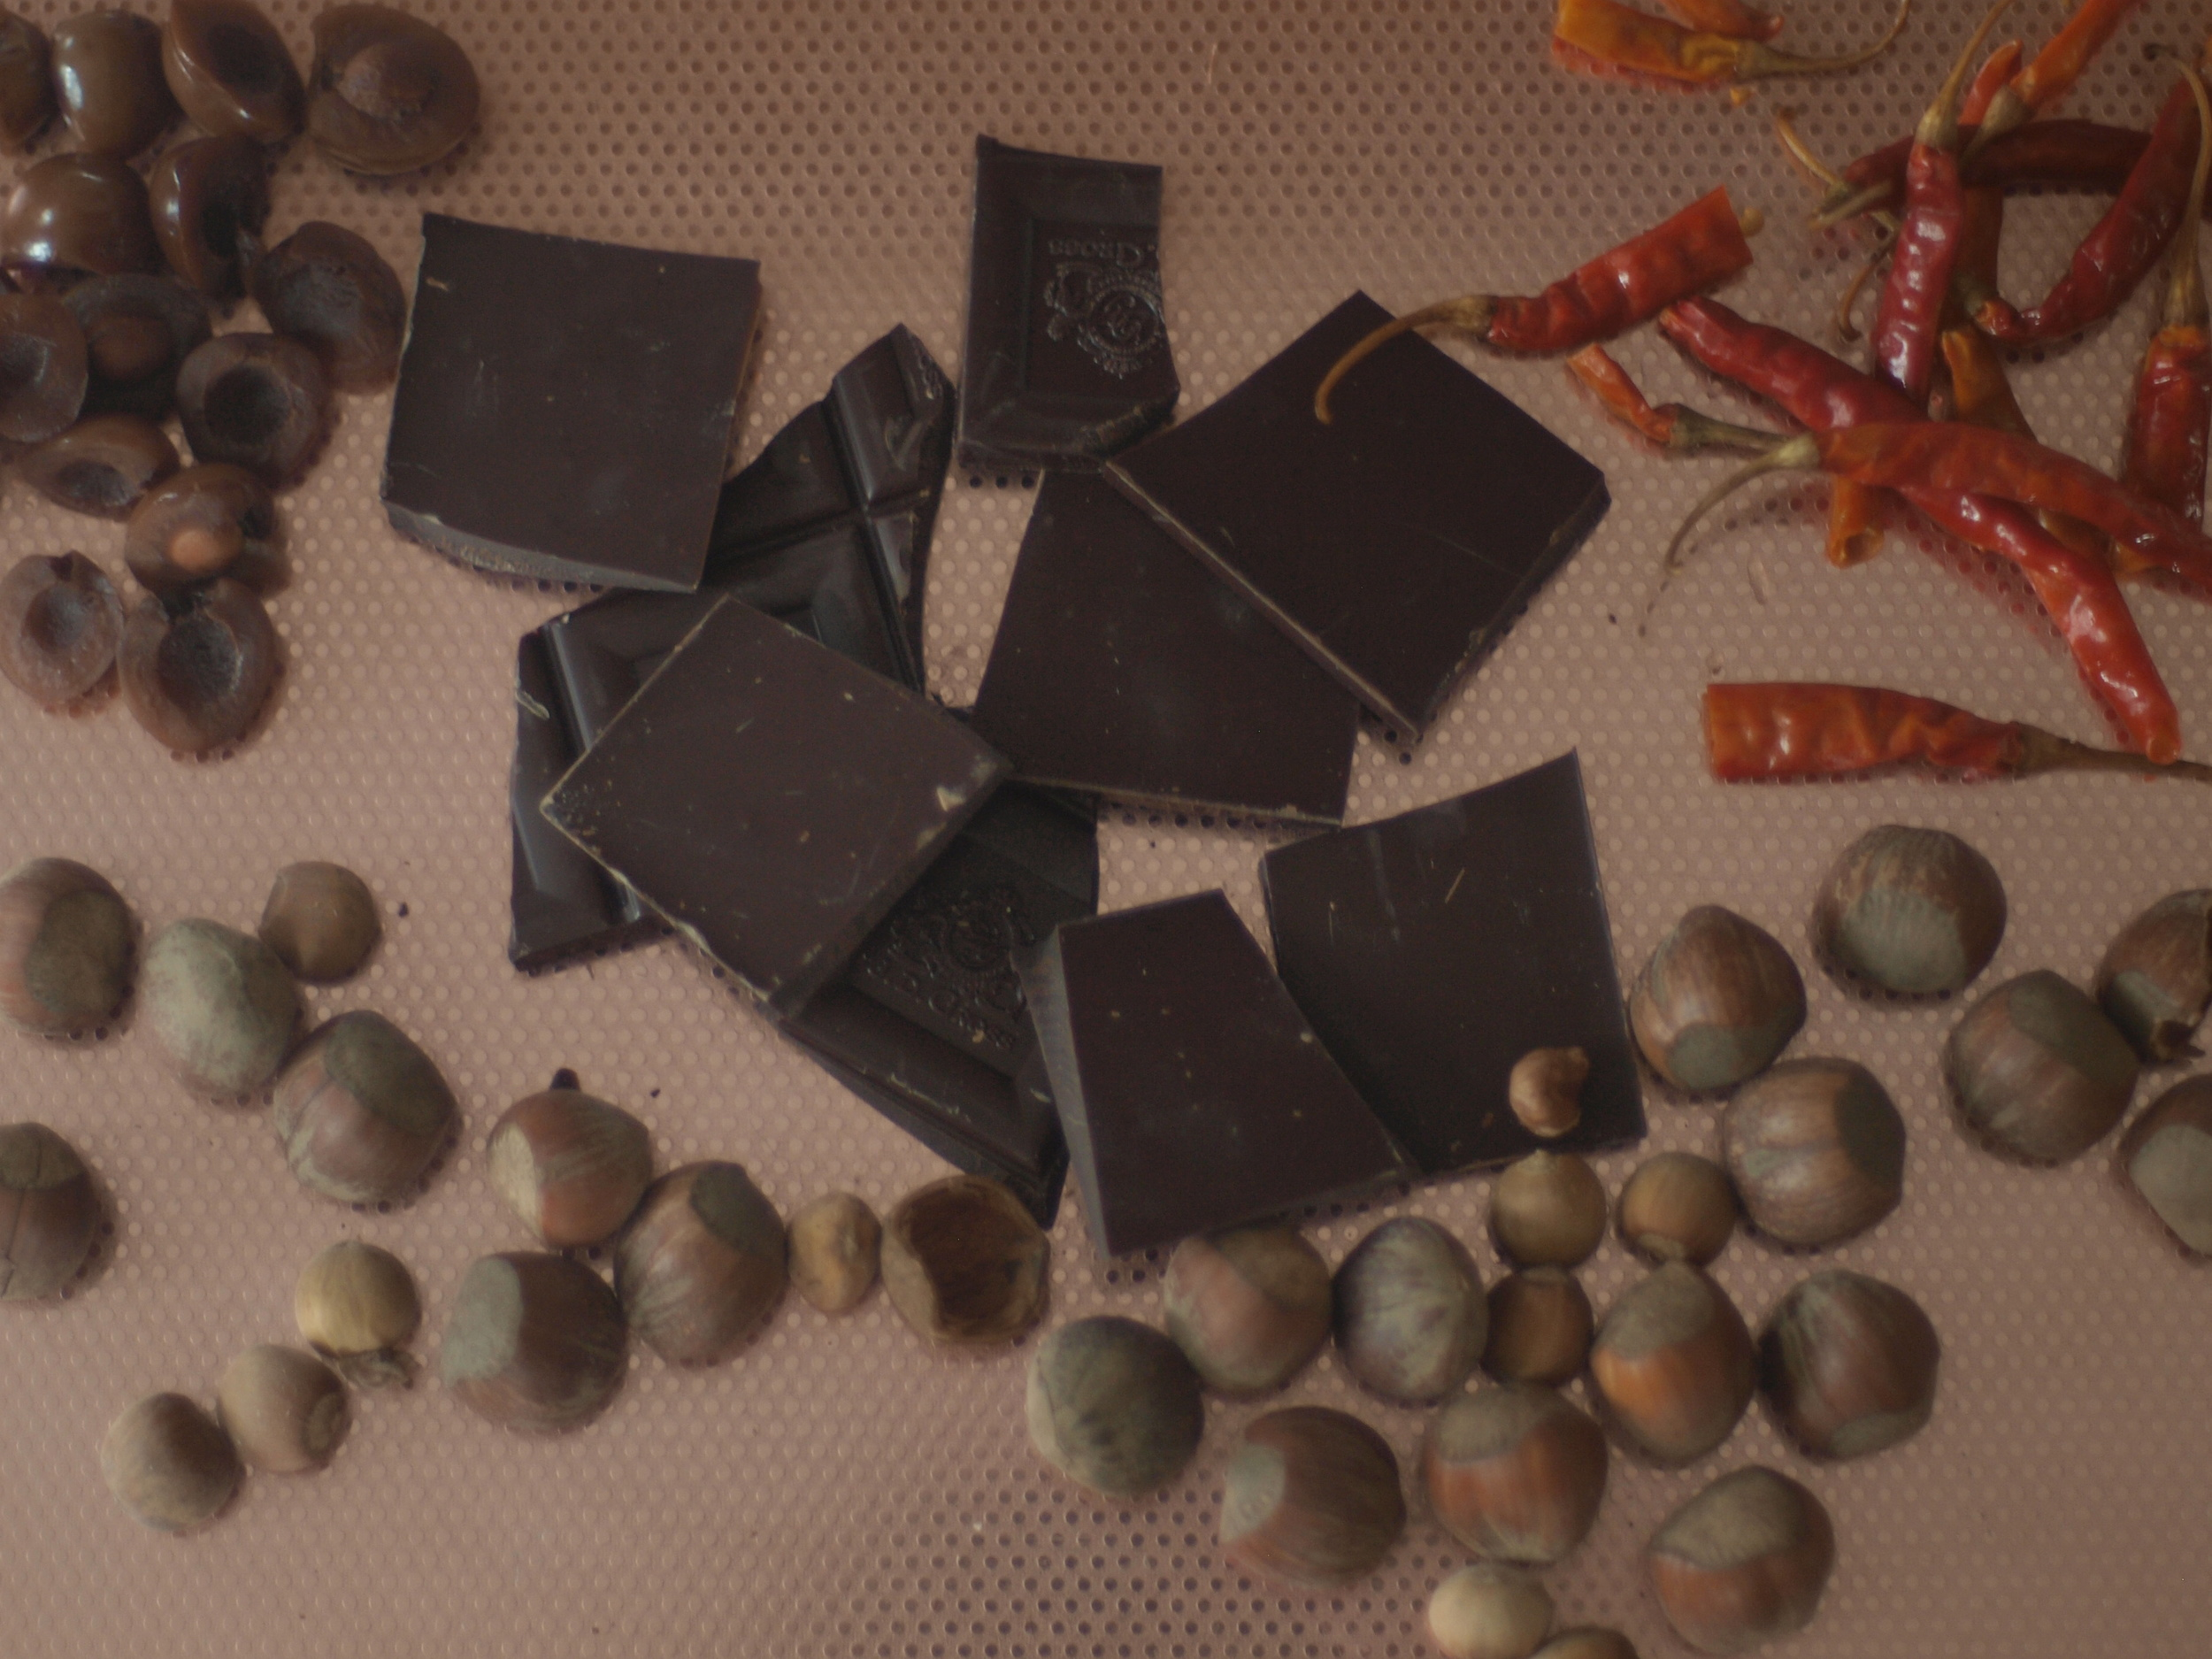 America Village, Poitin Chilli Cherry Chocolate